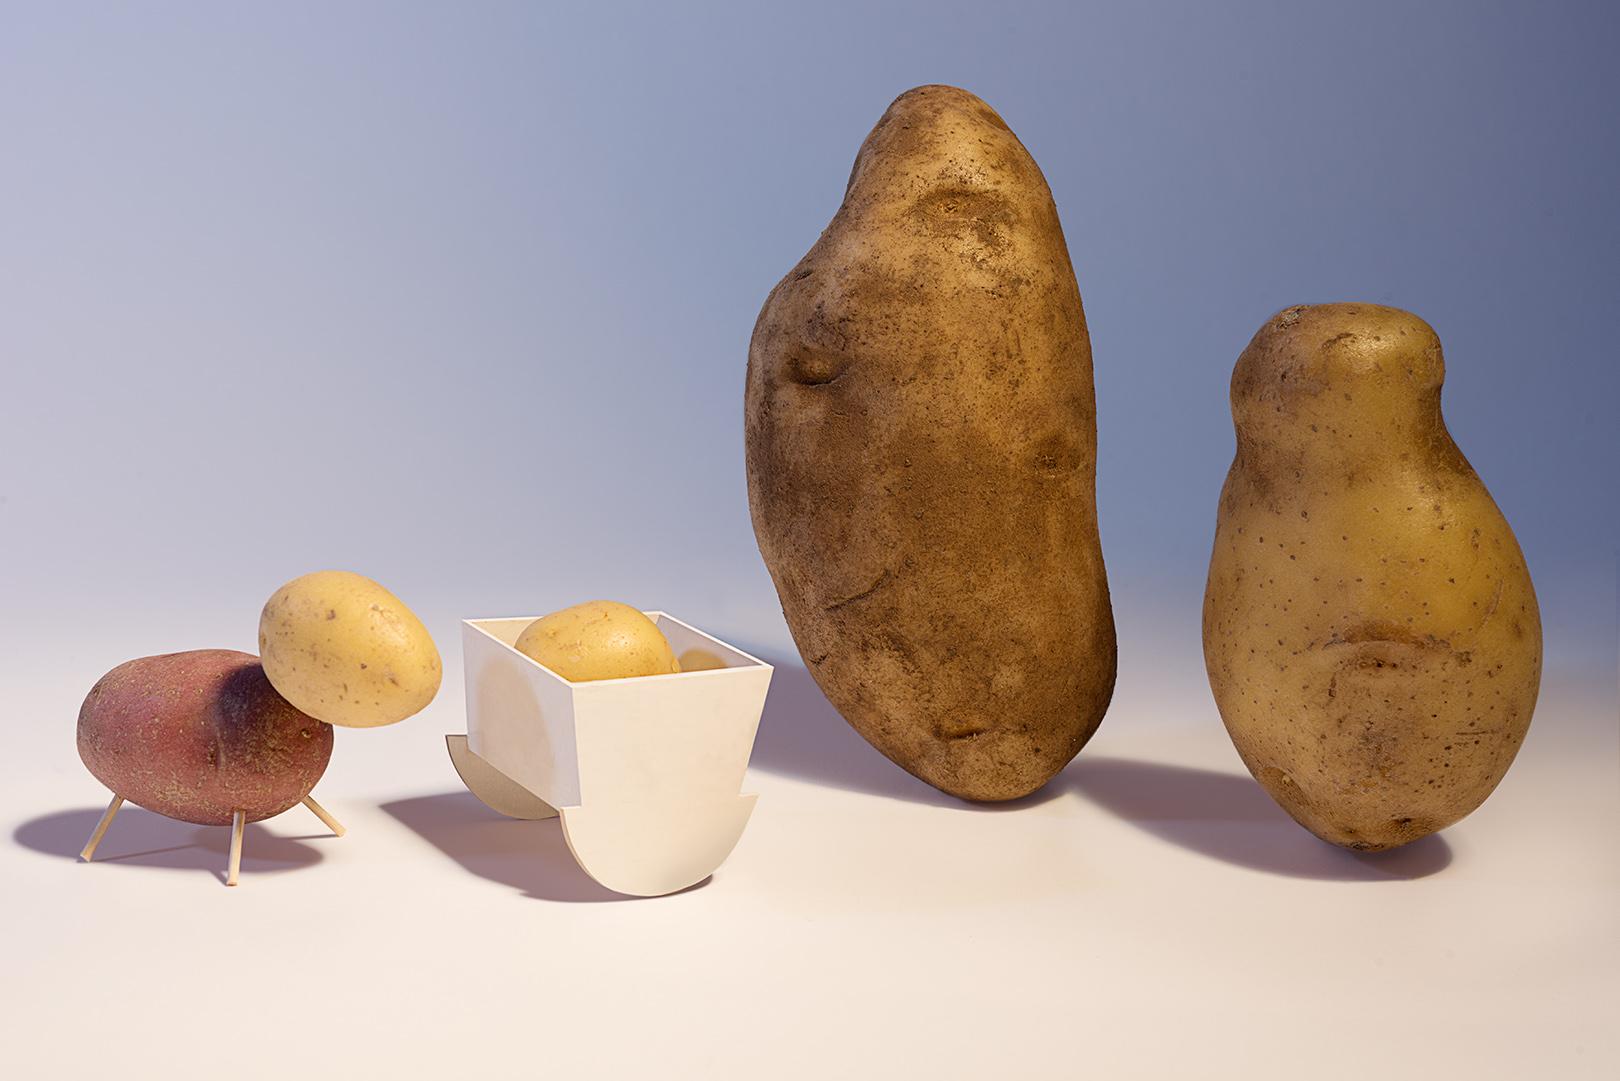 potato_family.jpg